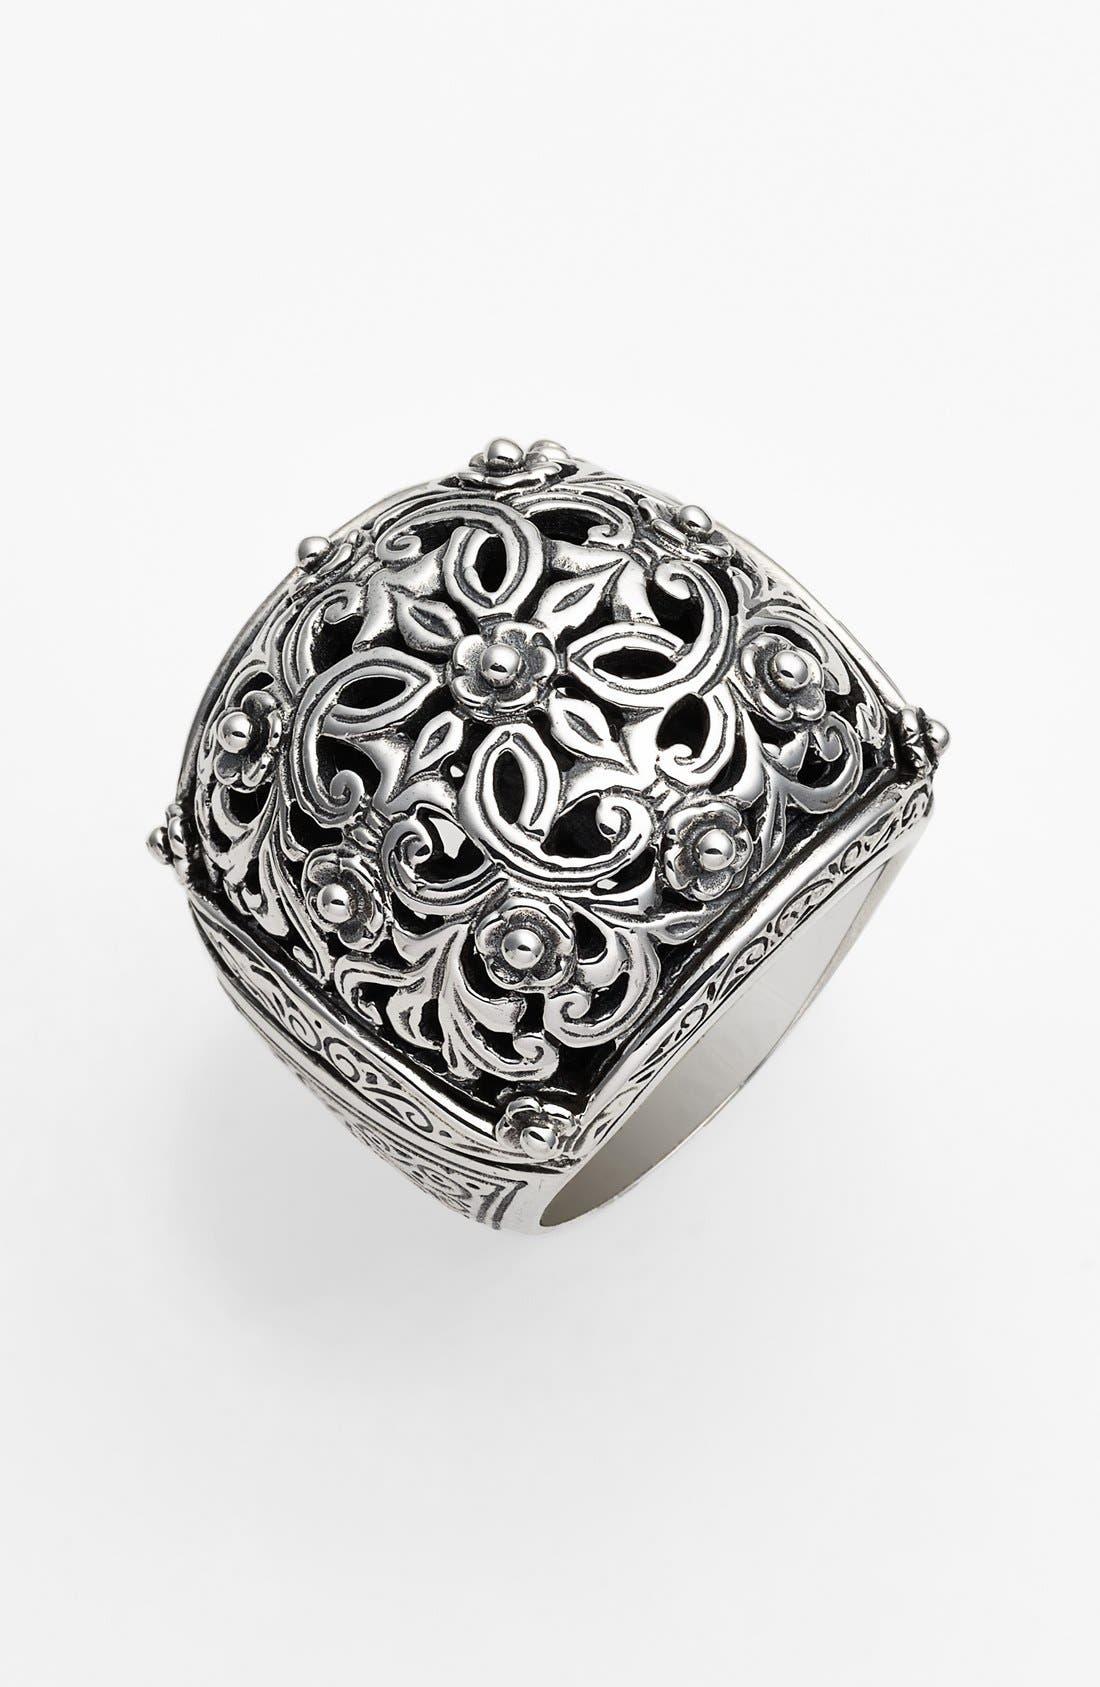 Alternate Image 1 Selected - Konstantino 'Classics' Filigree Dome Ring